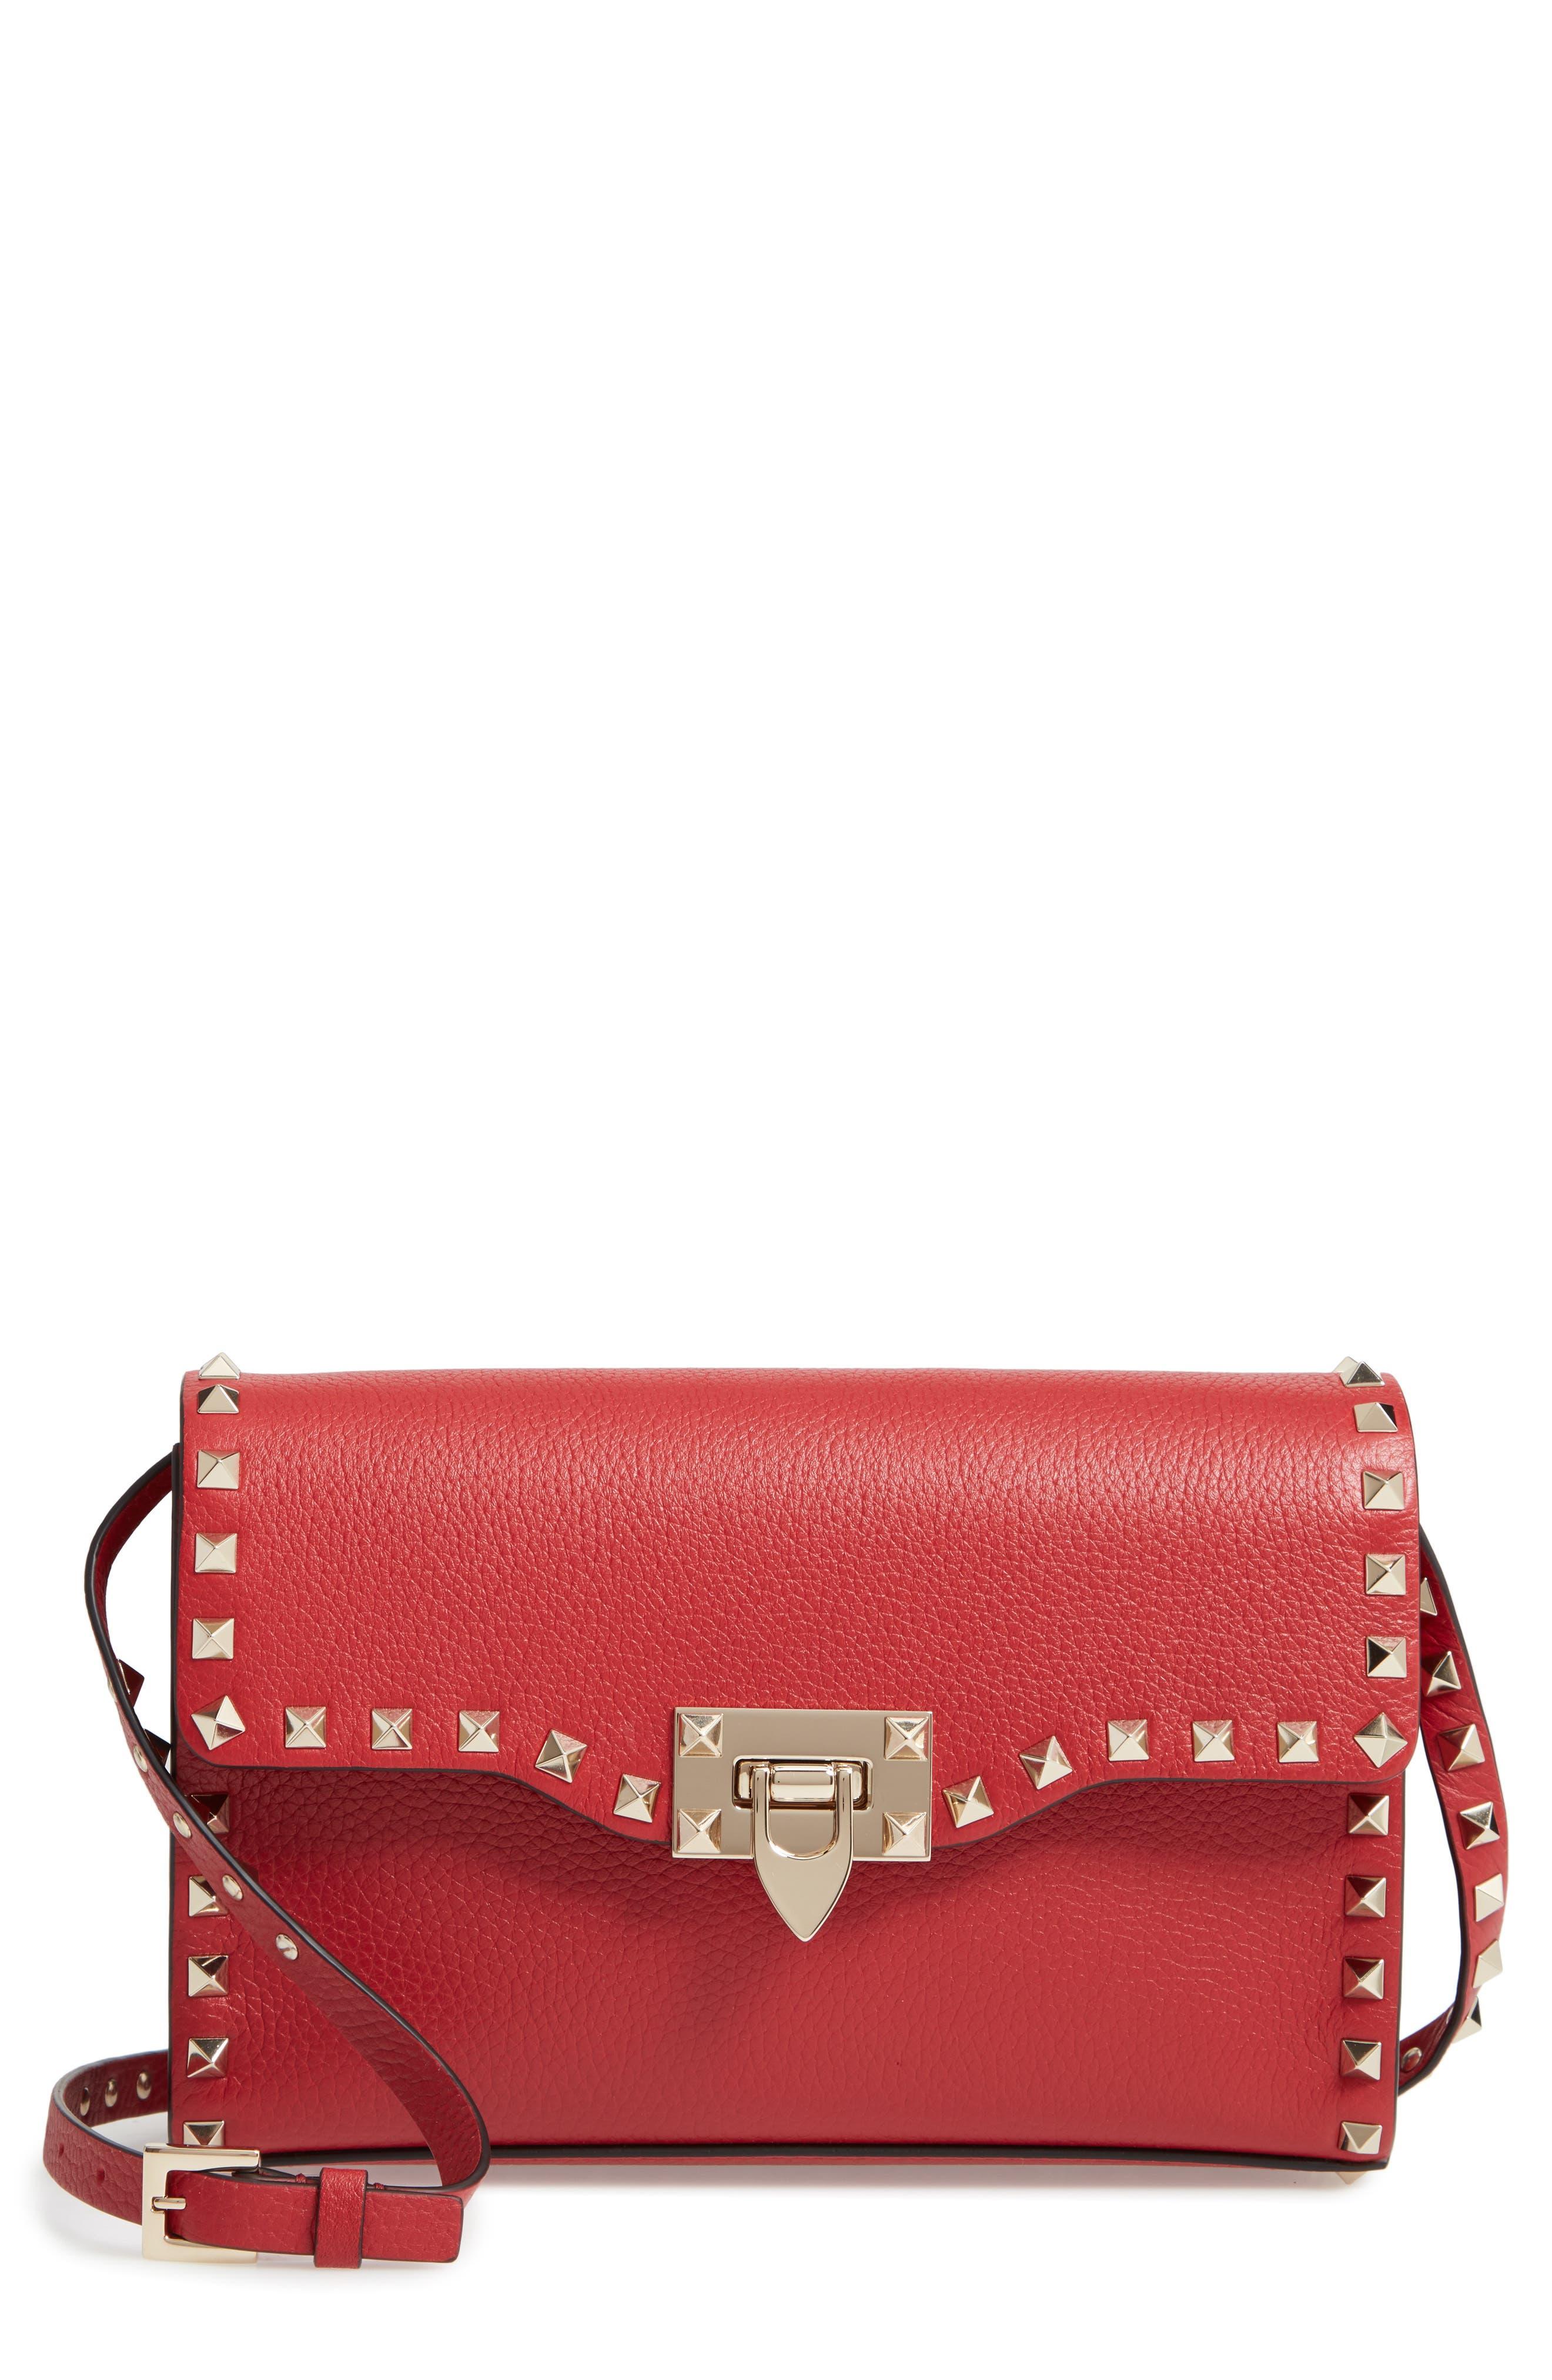 Medium Rockstud Leather Crossbody Bag, Main, color, ROSSO V